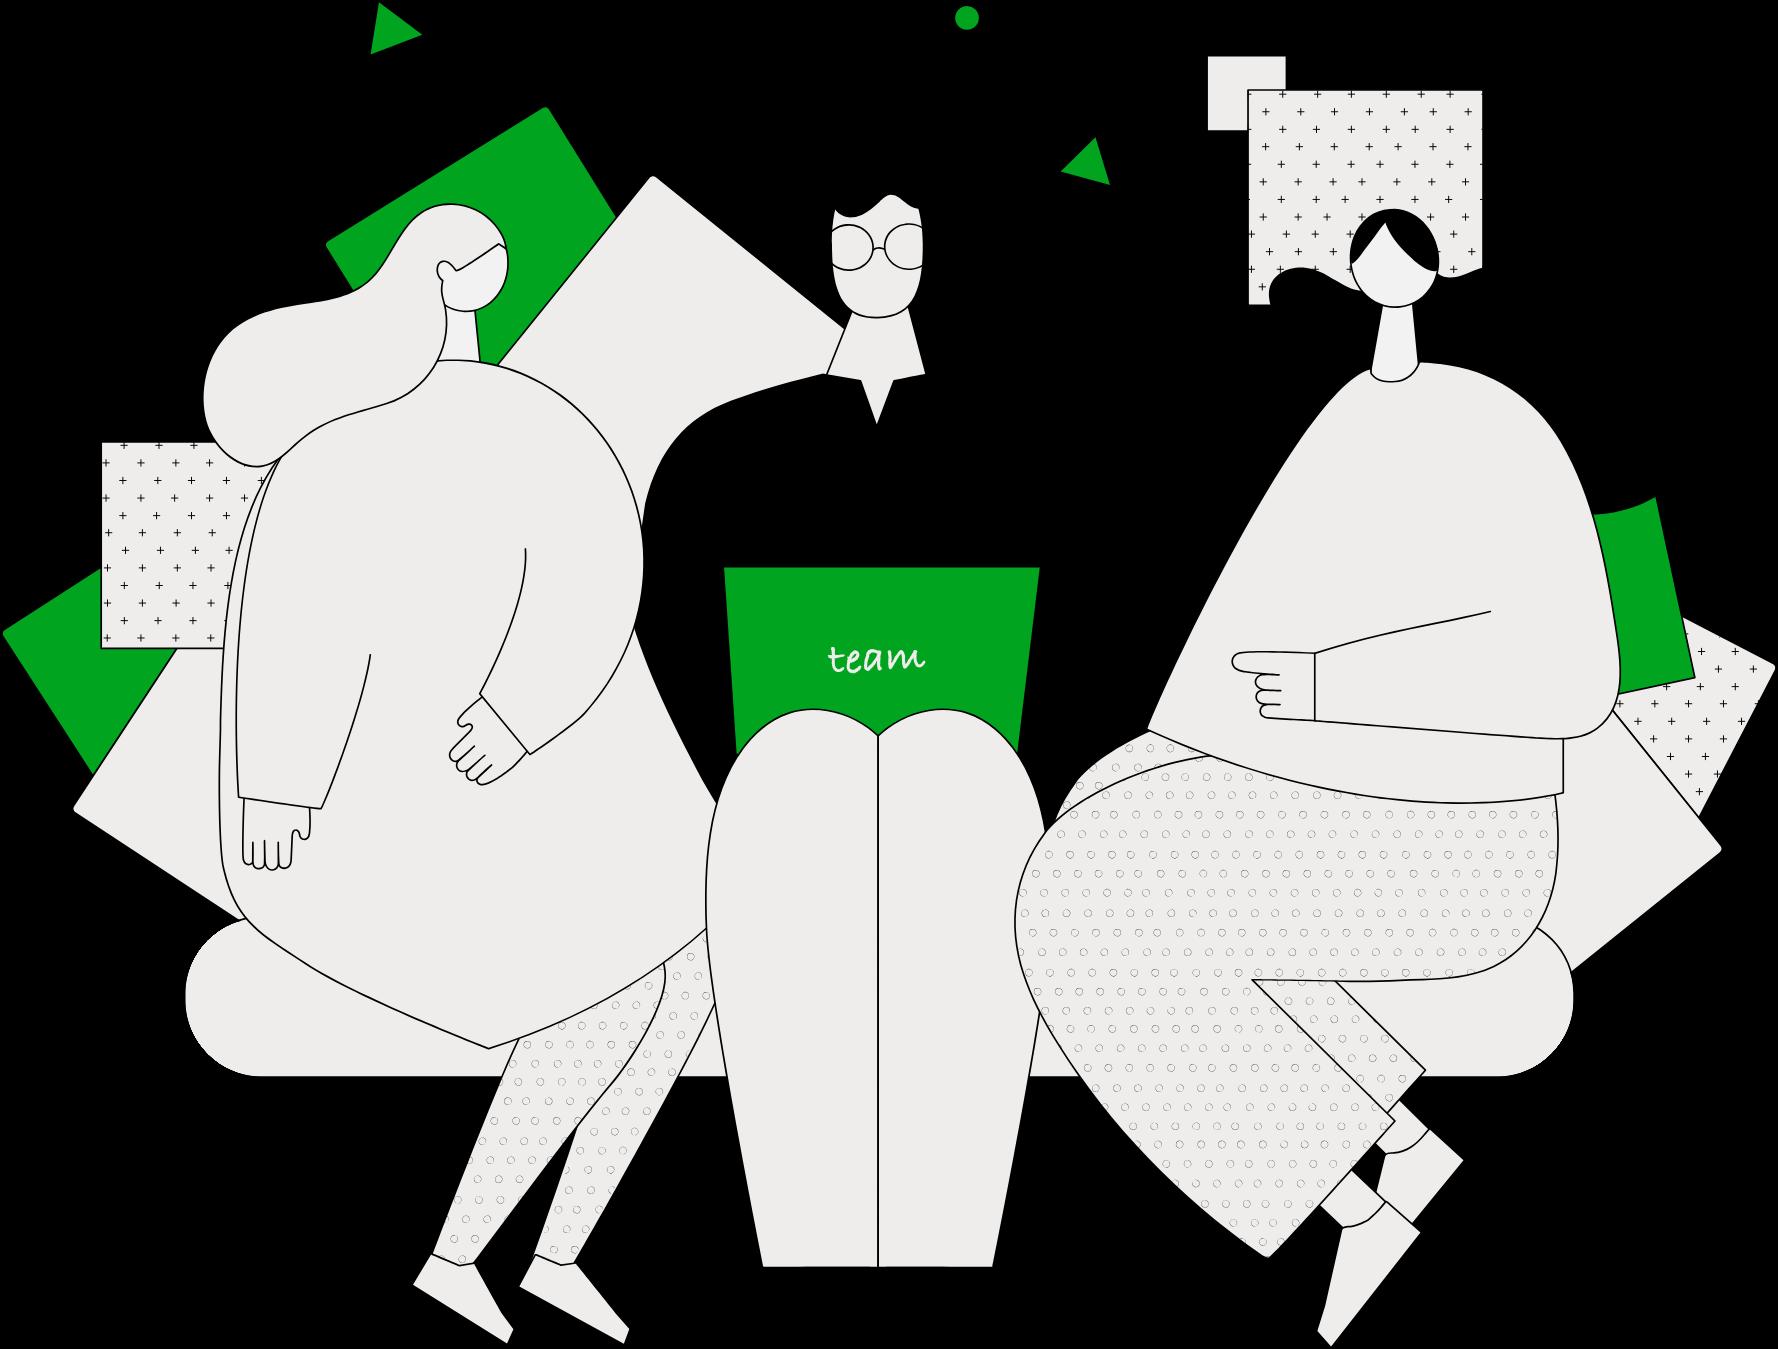 Process step image